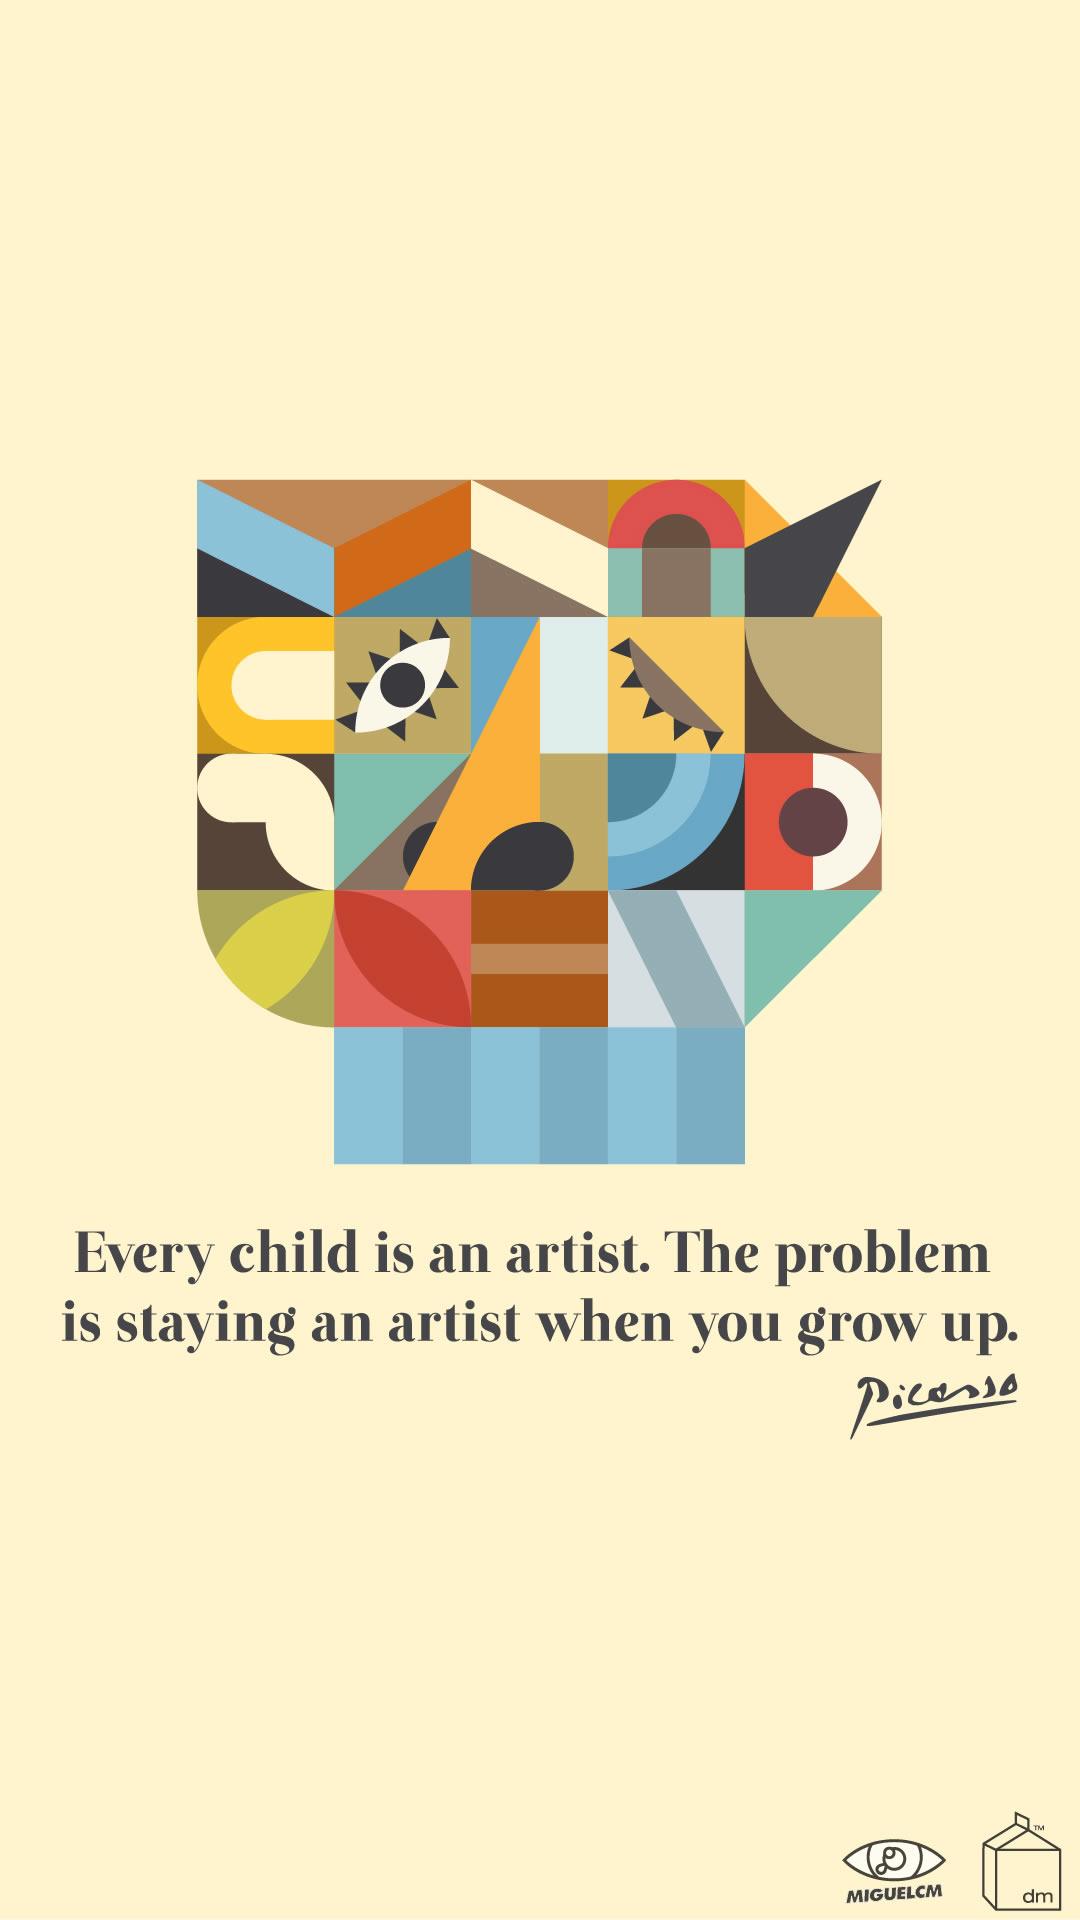 Design Milk Wallpaper Picasso Quotes Iphone 1845479 Hd